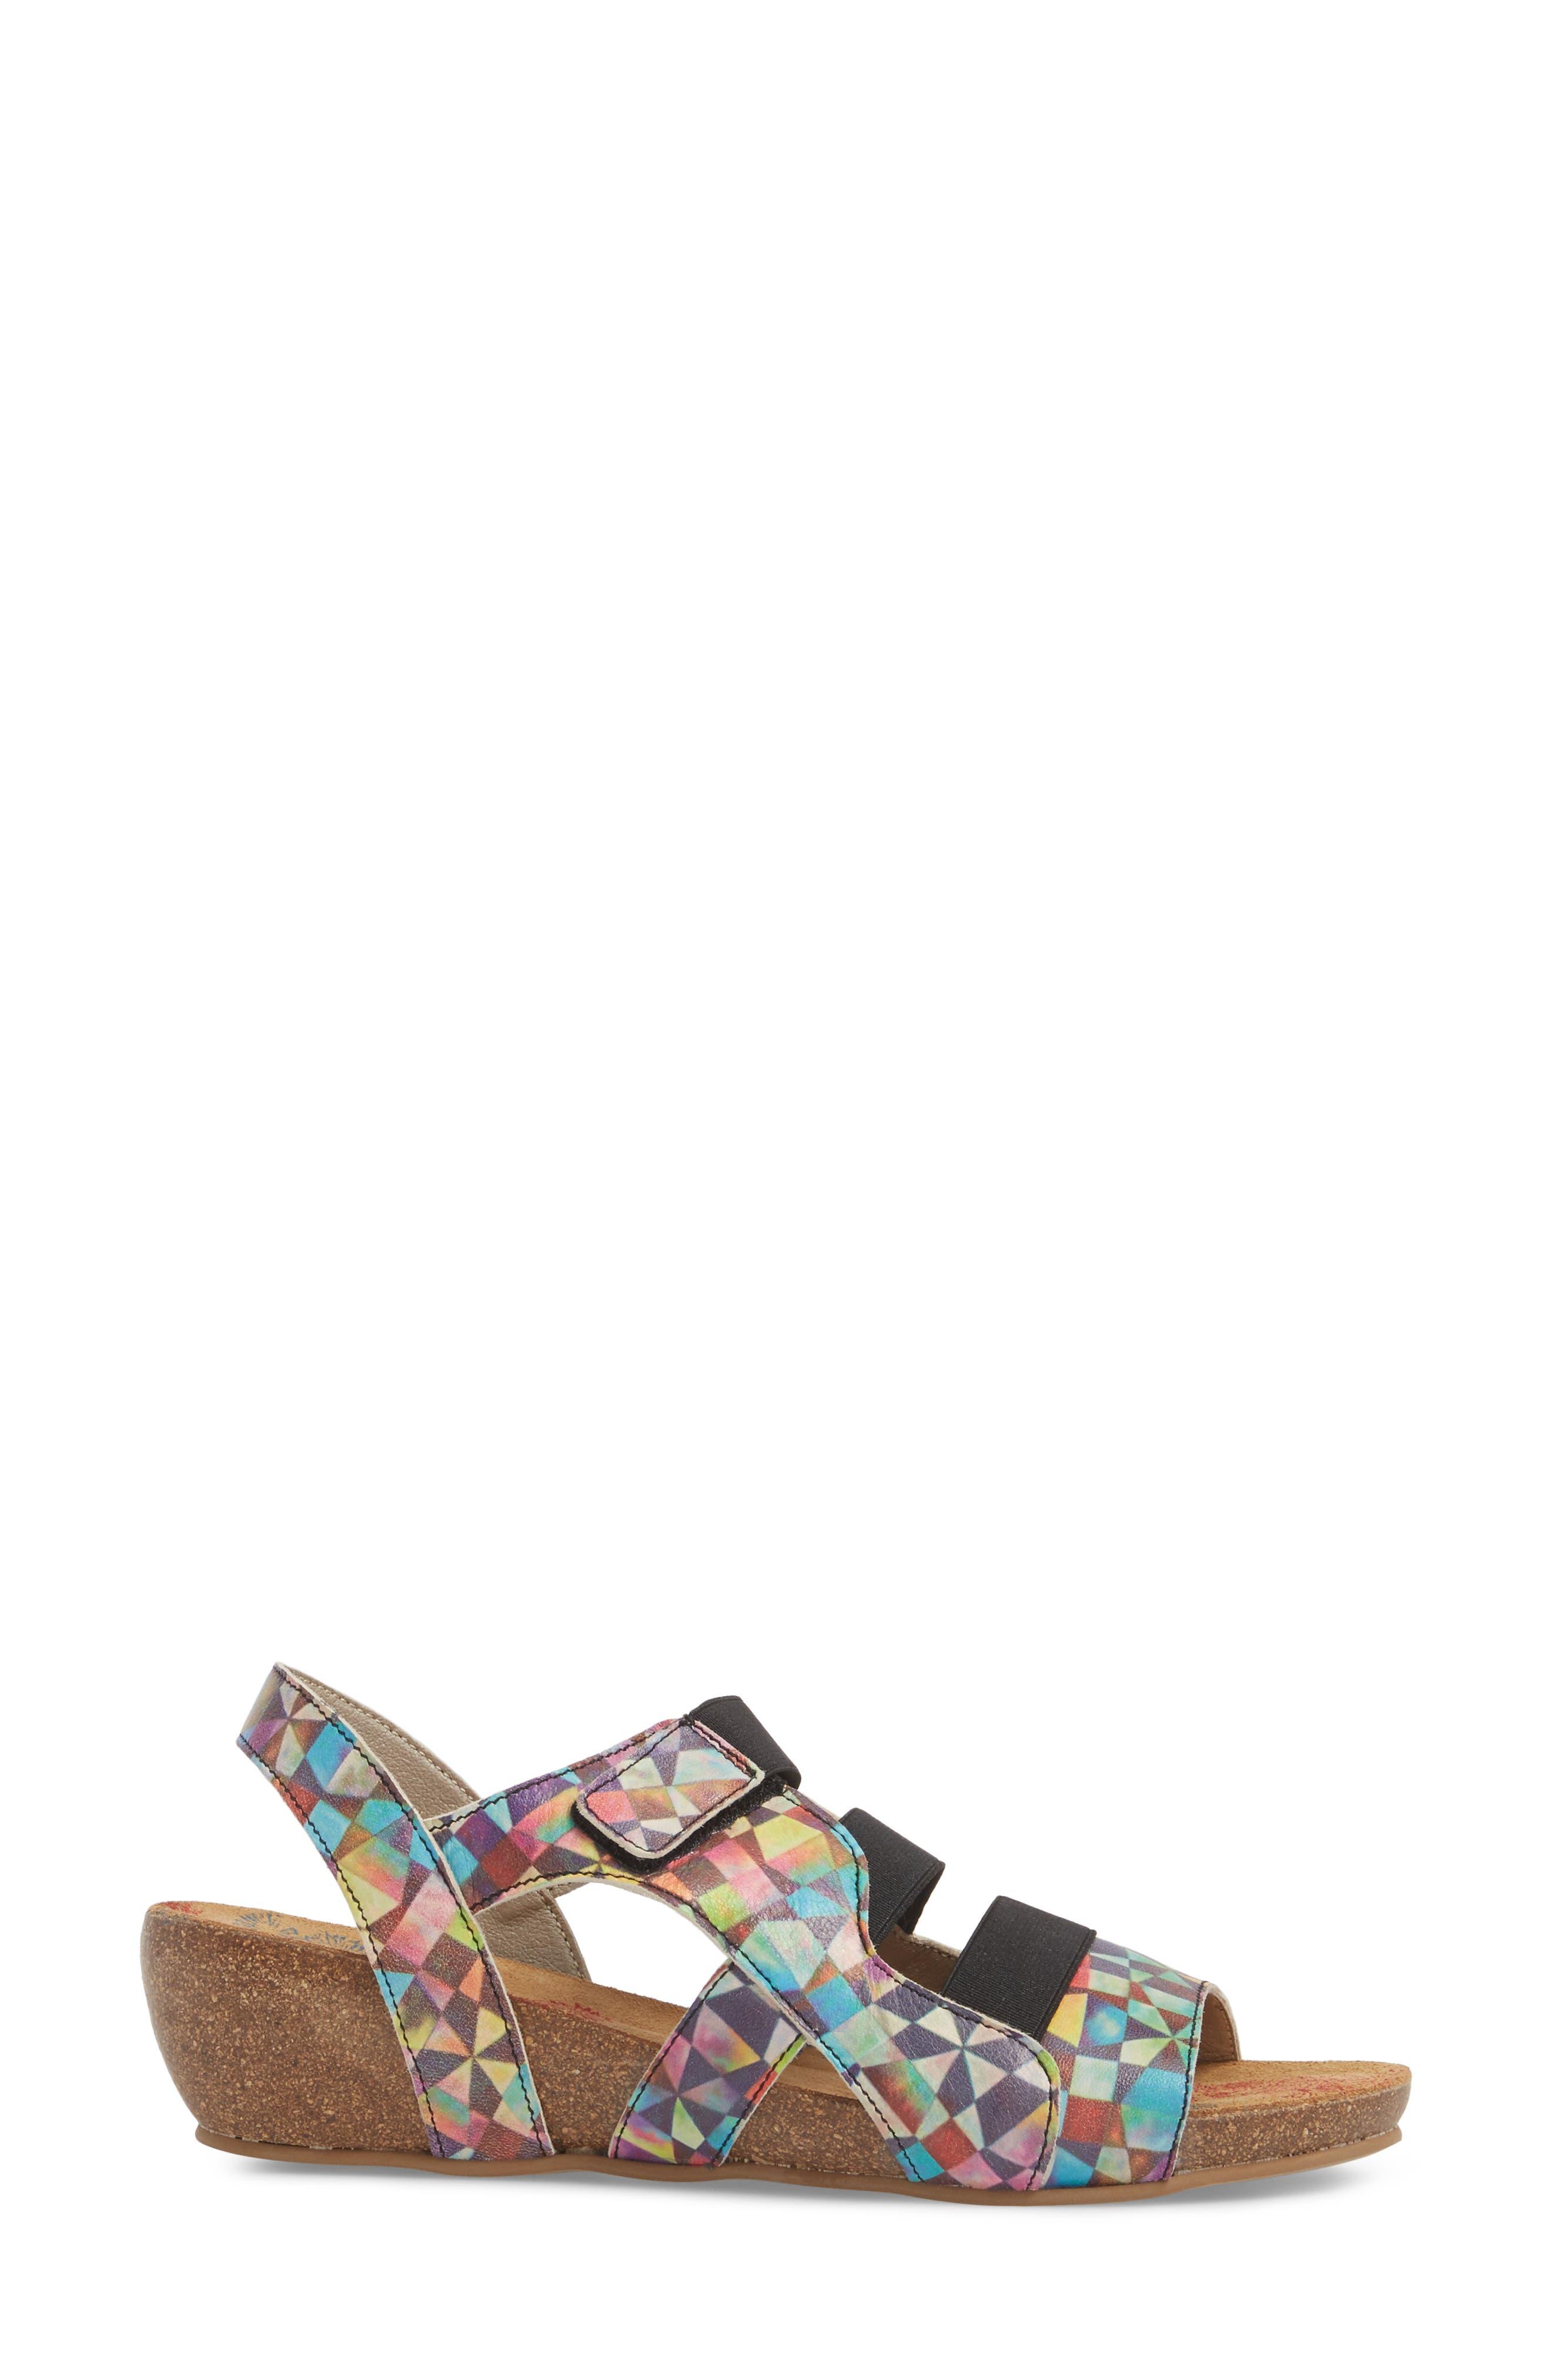 Duffy Wedge Sandal,                             Alternate thumbnail 3, color,                             Mystere Leather